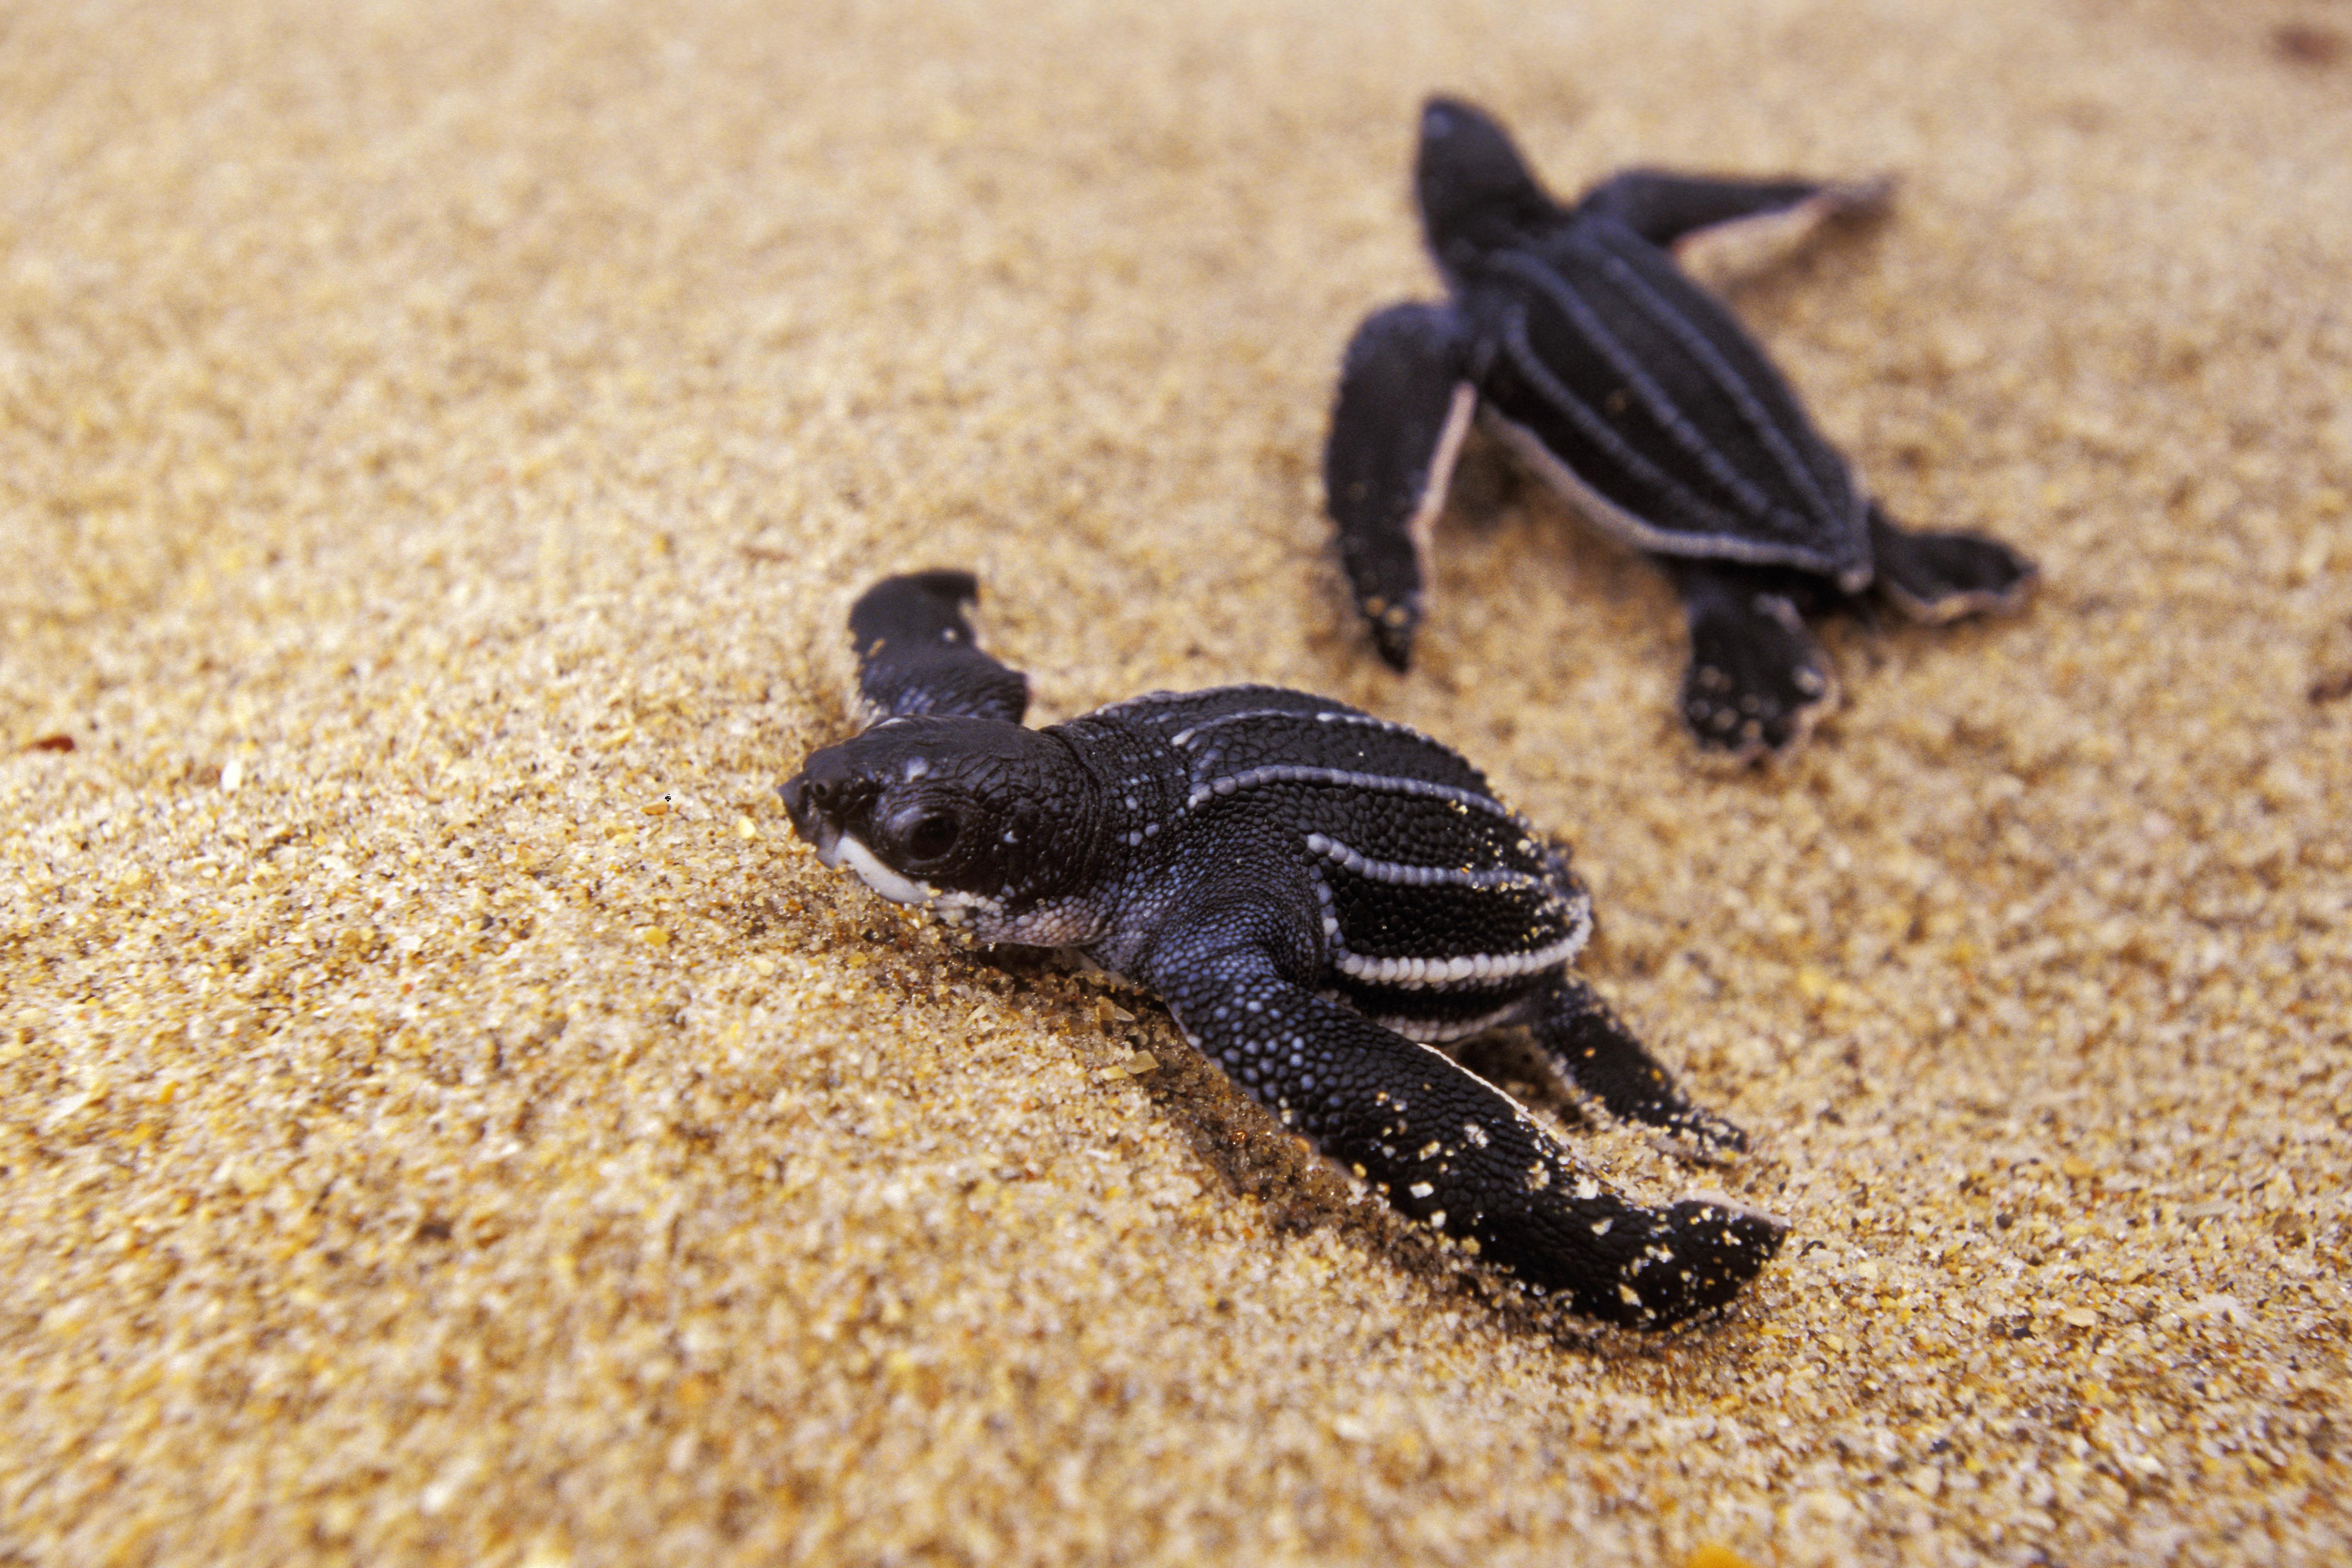 Live Webcam Captures Hatching Of Endangered Baby Turtles In Florida Time